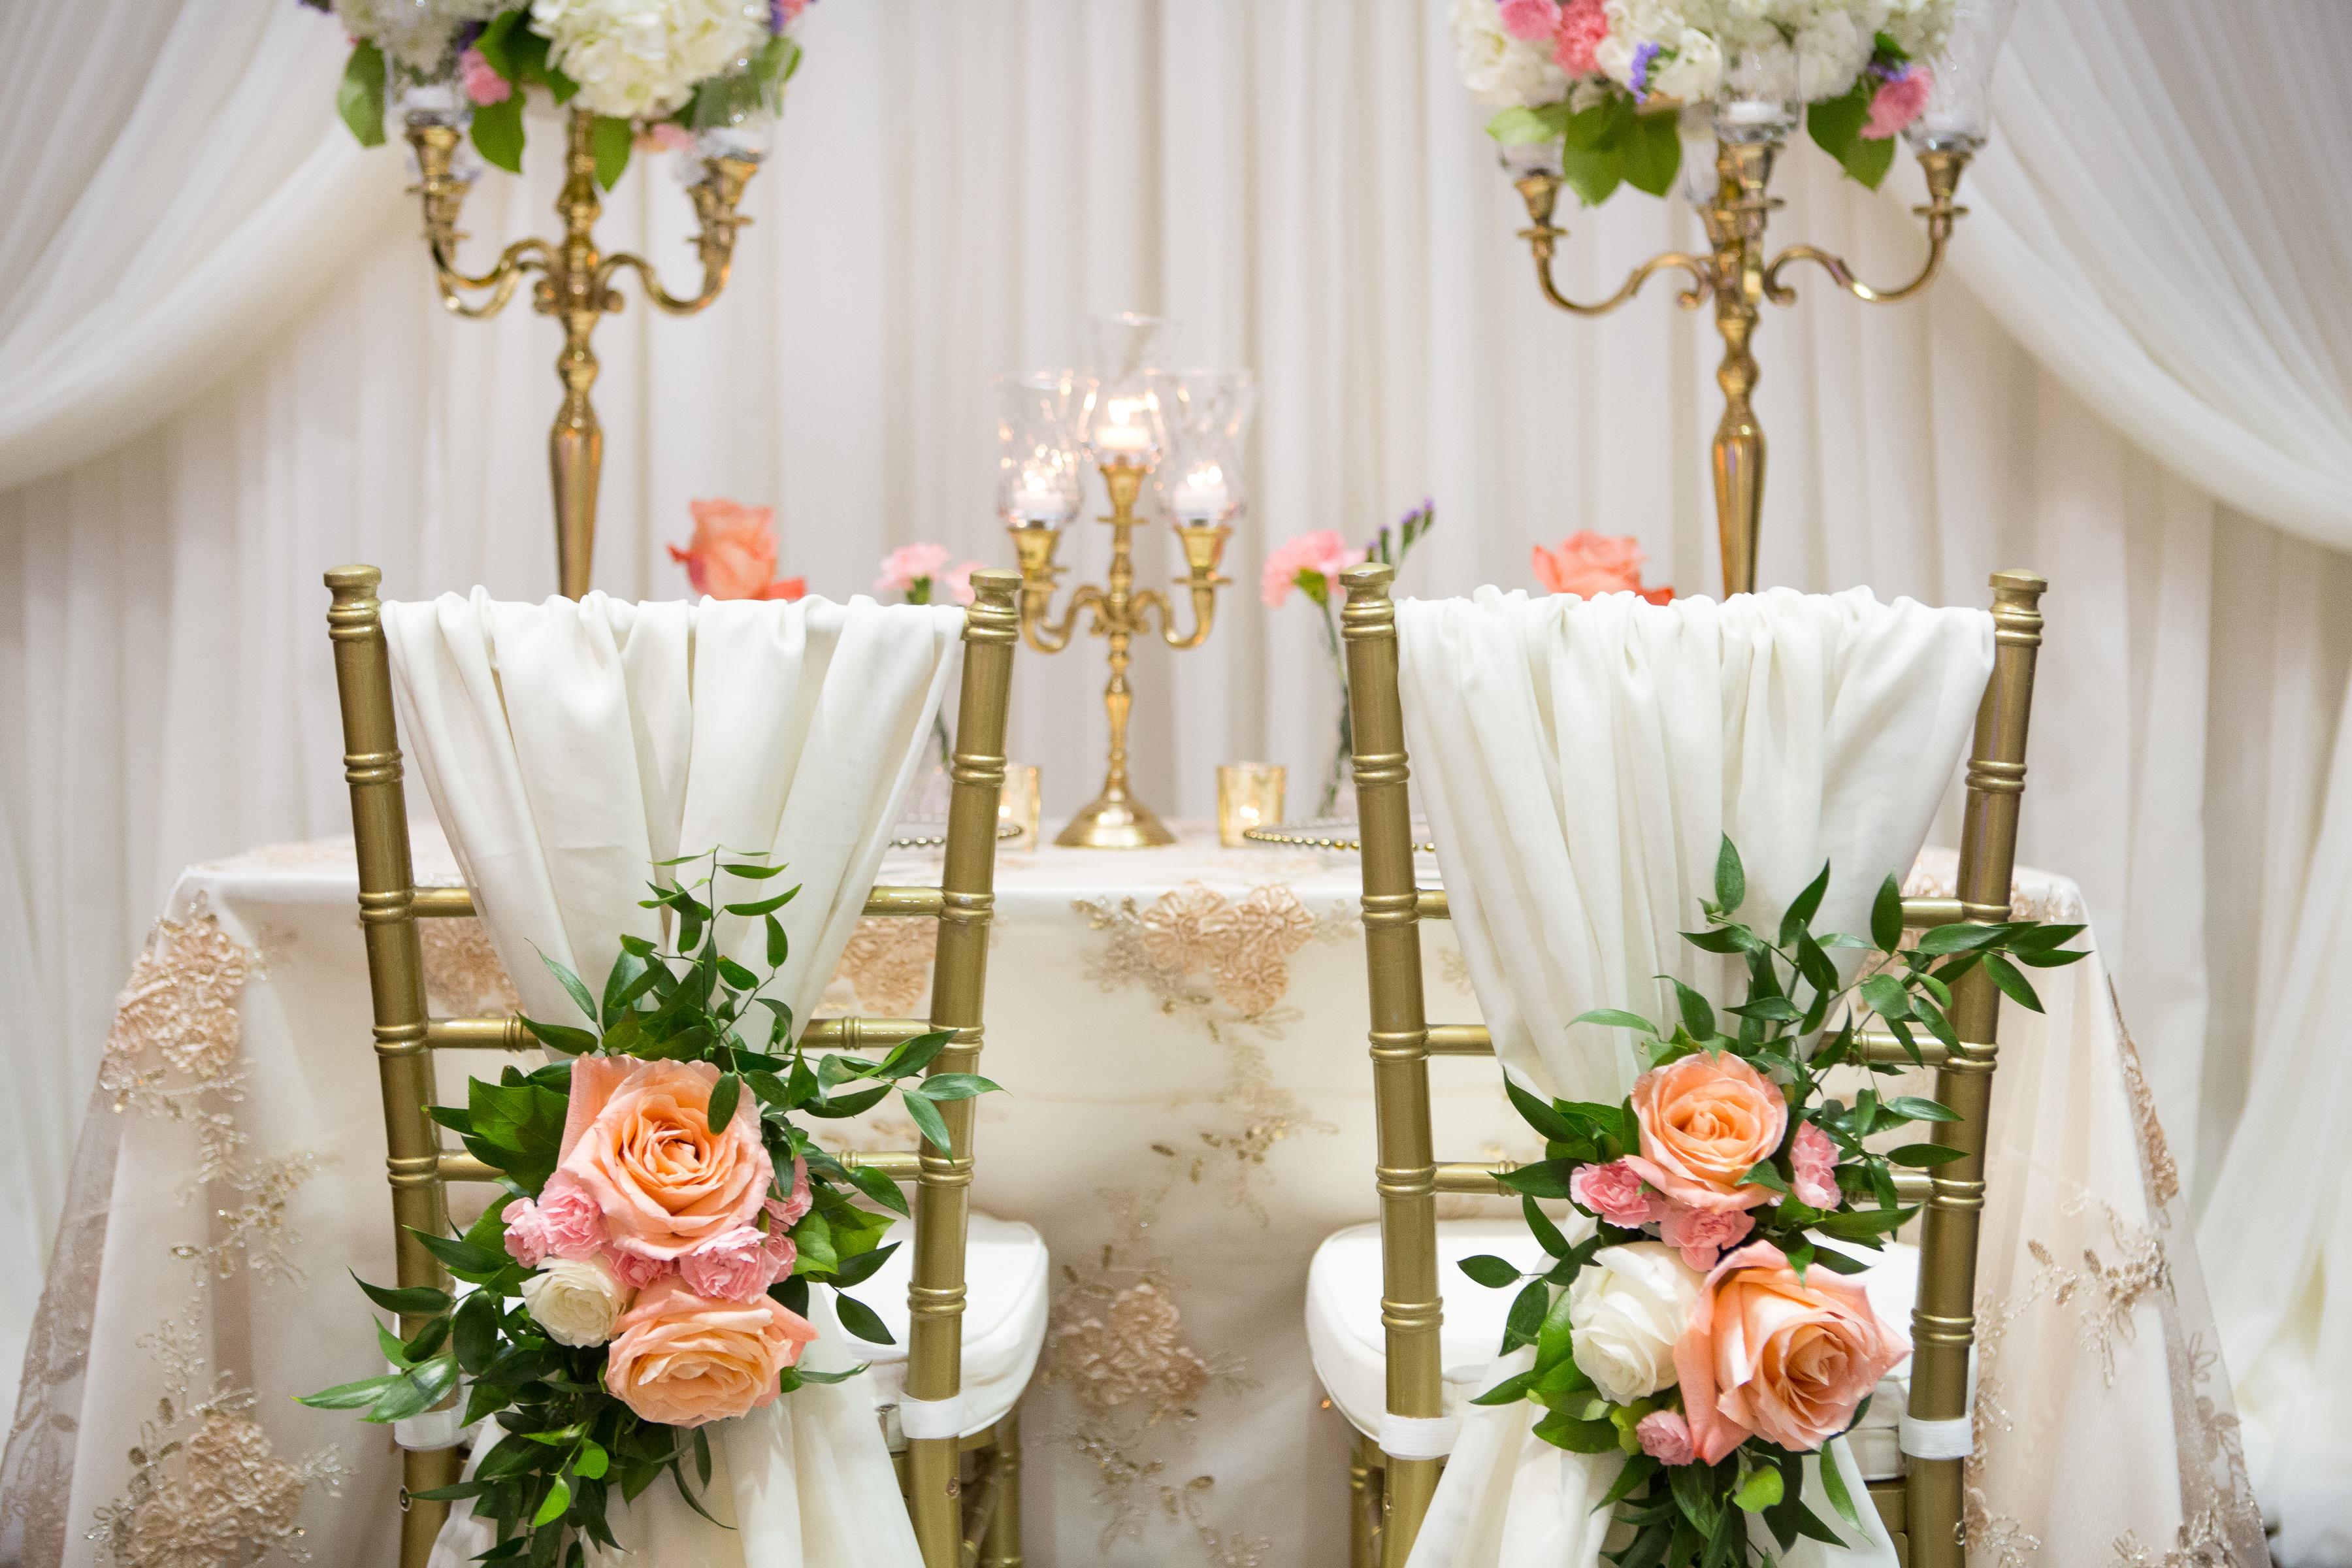 Hamilton-Halton Fall Wedding Show 2016 - Decor Booth Display